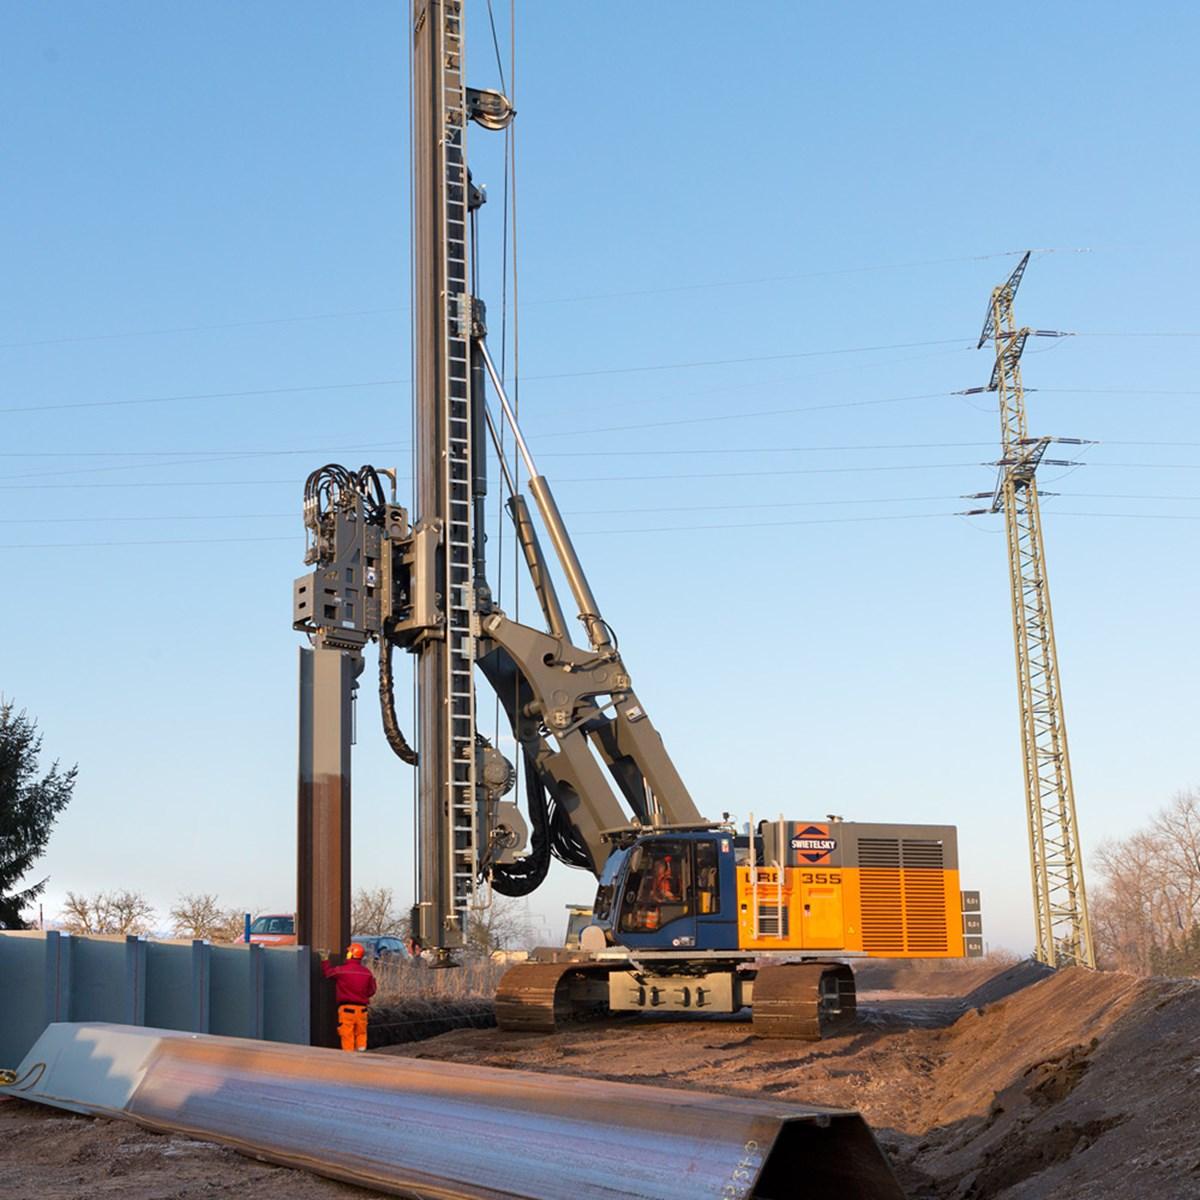 liebherr-lrb-355-piling-and-drilling-rig-vibrator2-1.jpg